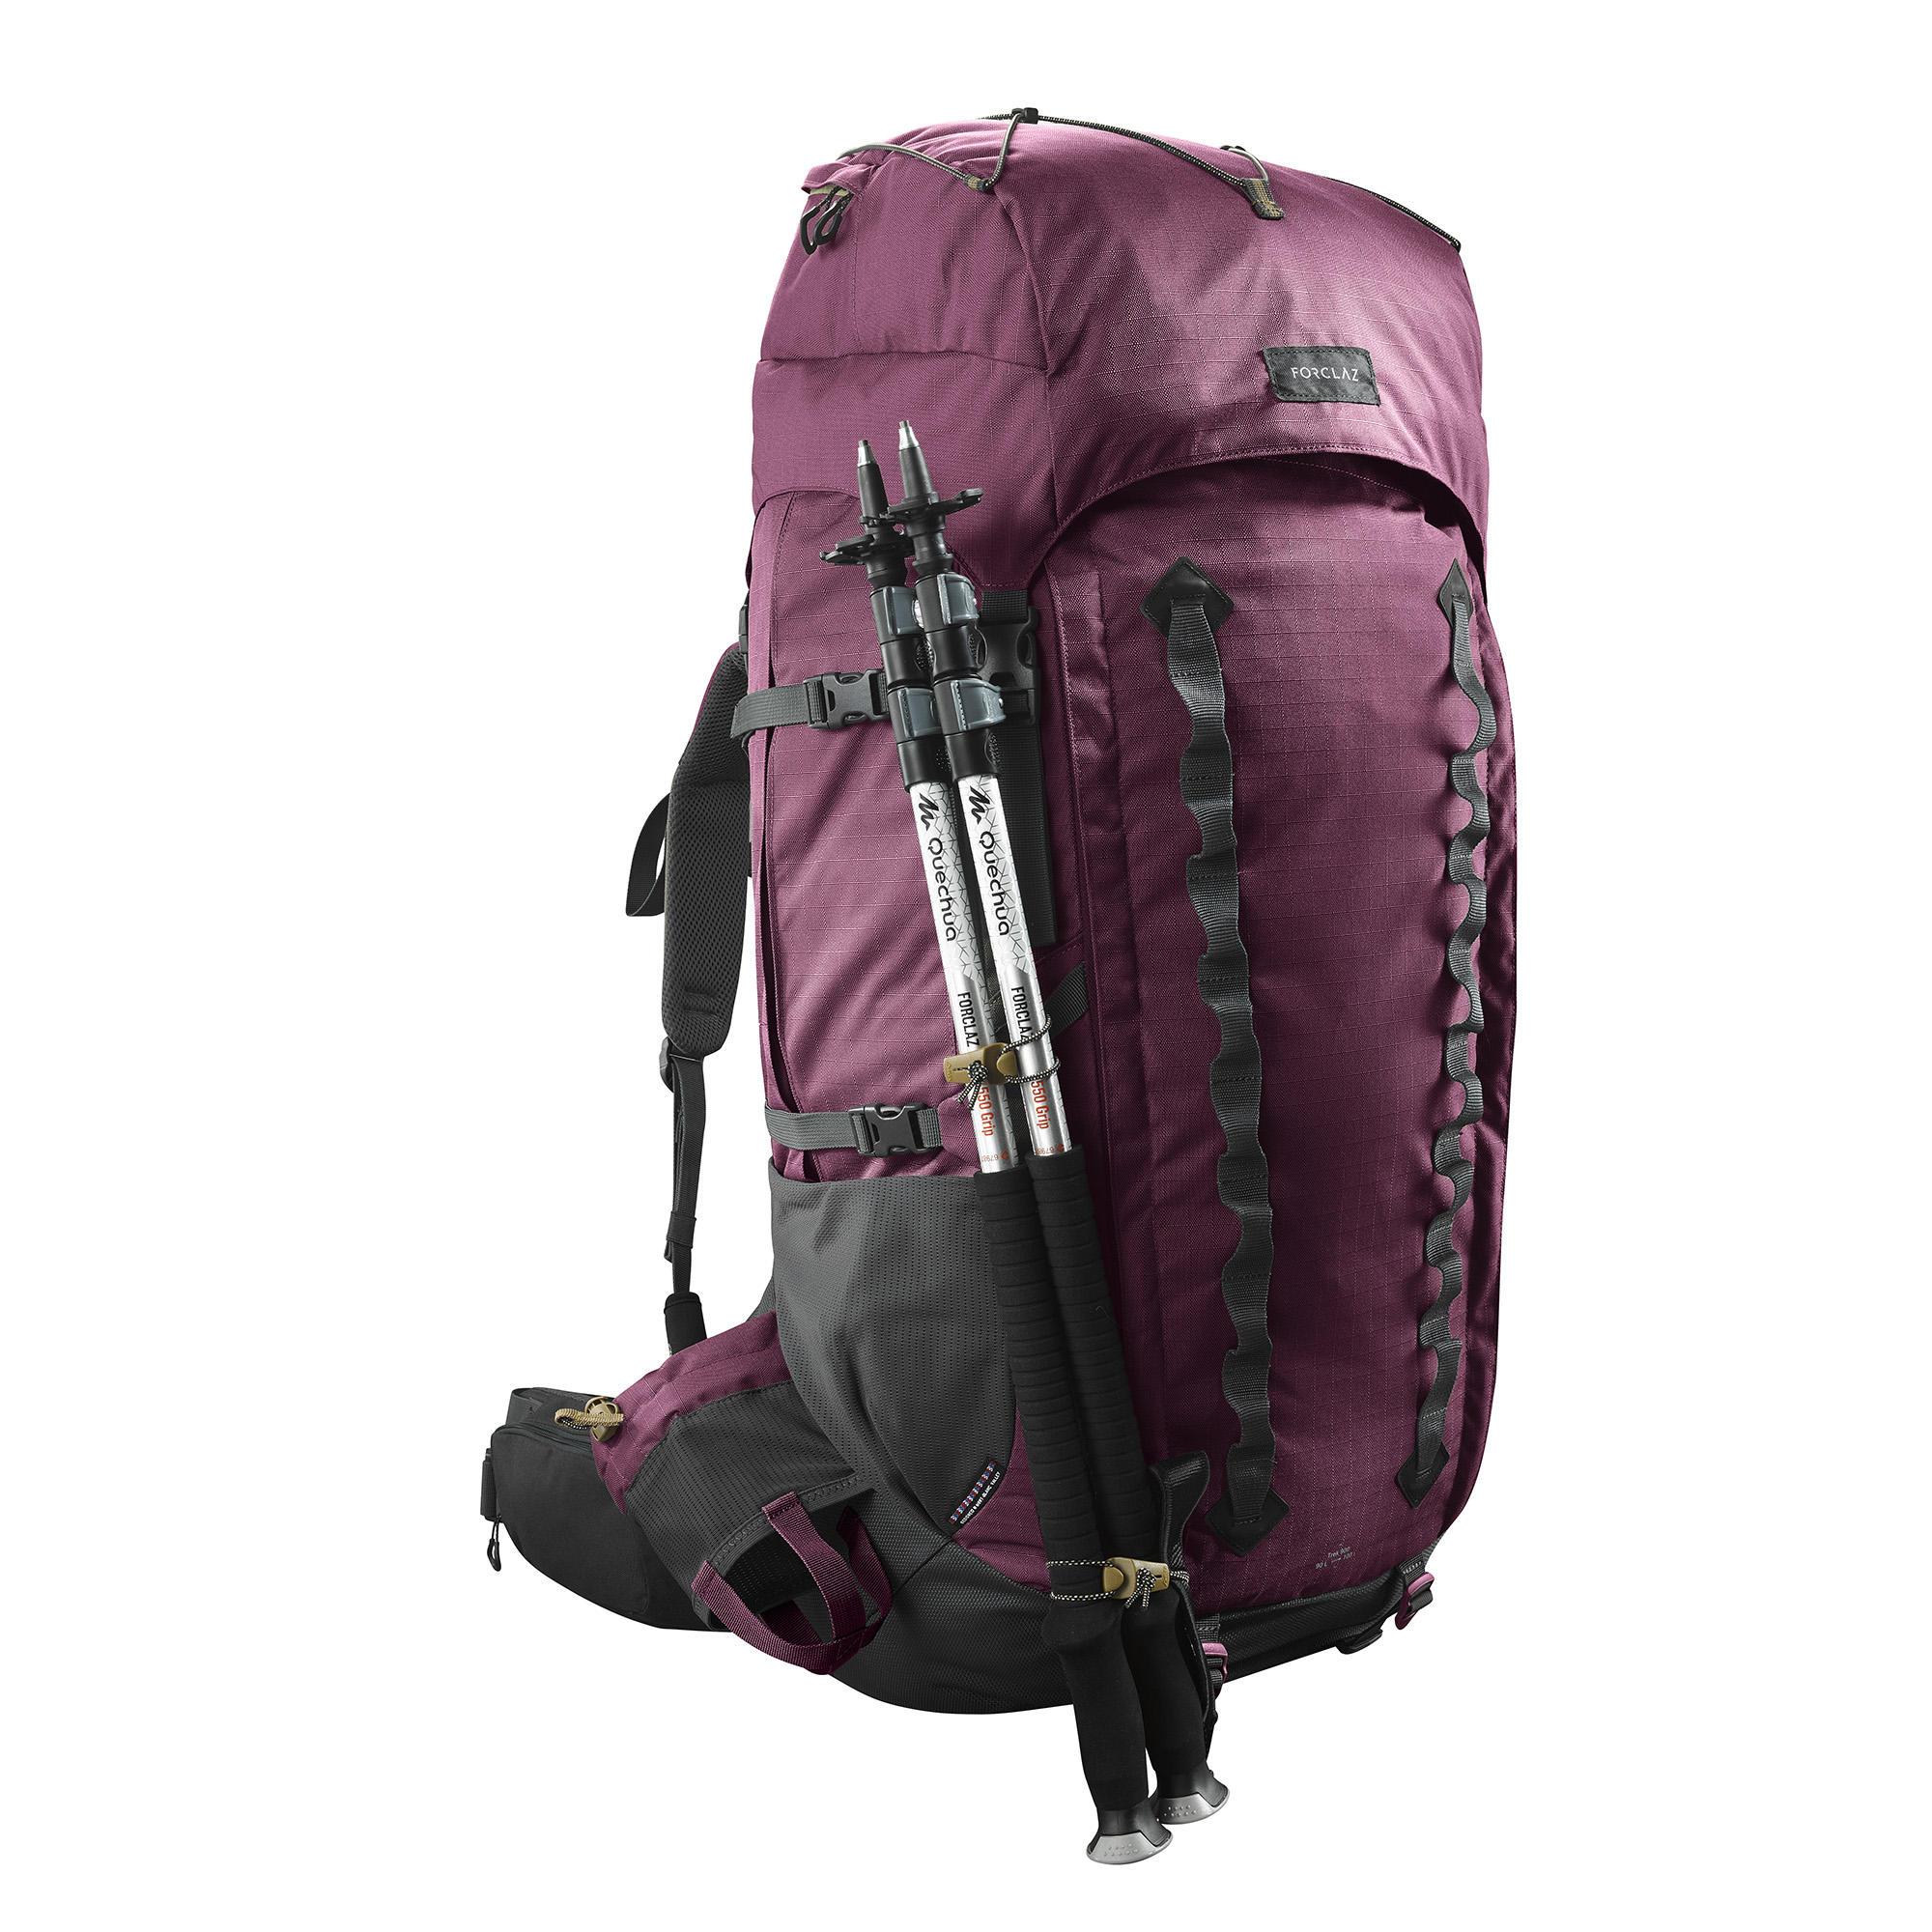 8943482dff3 Forclaz Bergsport rugzak voor dames Trek 900 70 l +10 l Symbium bordeaux |  Decathlon